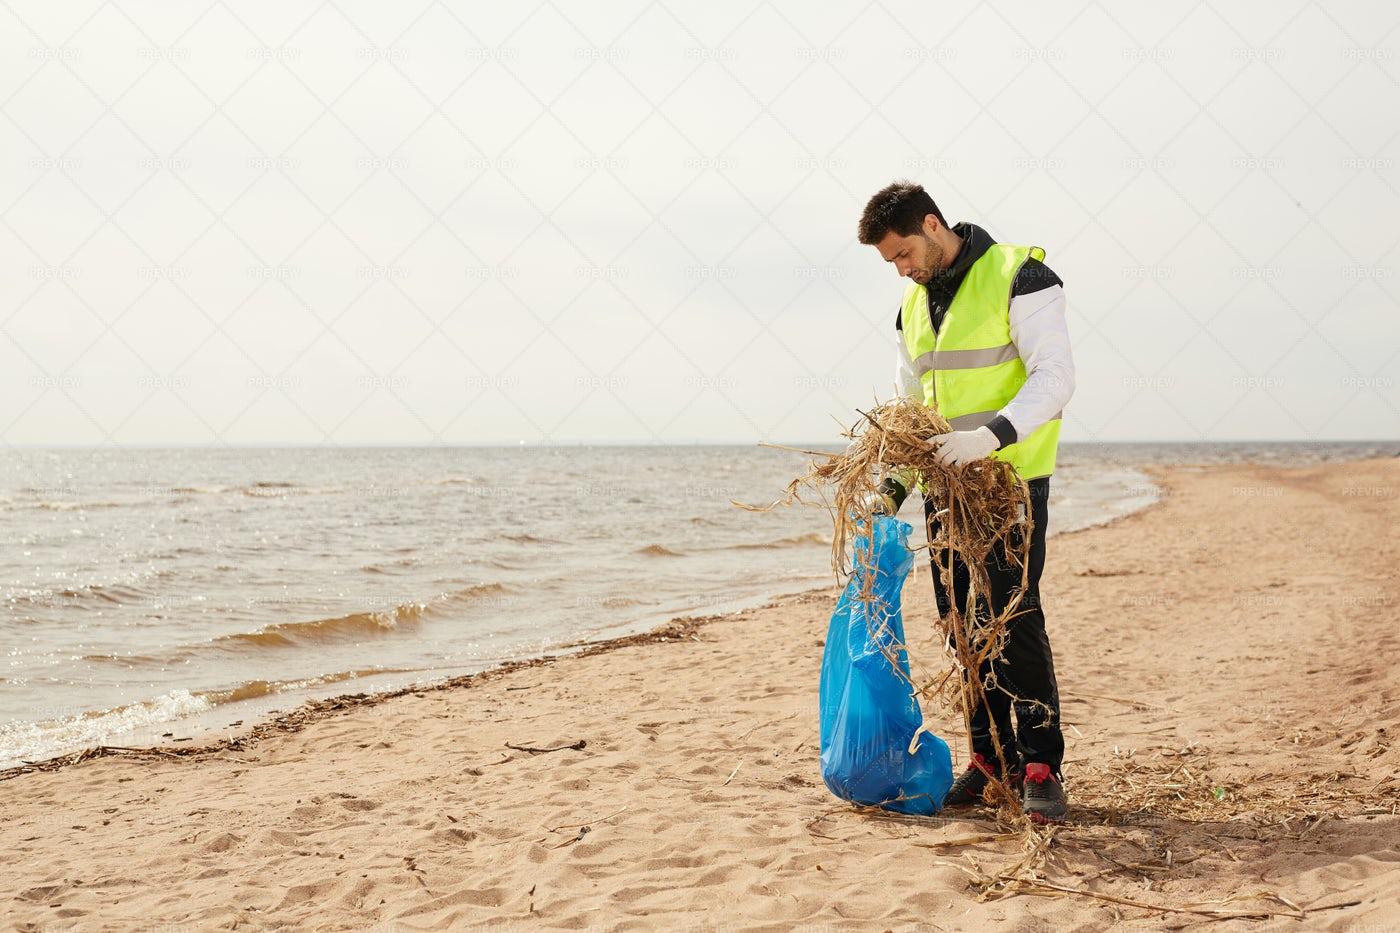 Volunteer On The Beach: Stock Photos